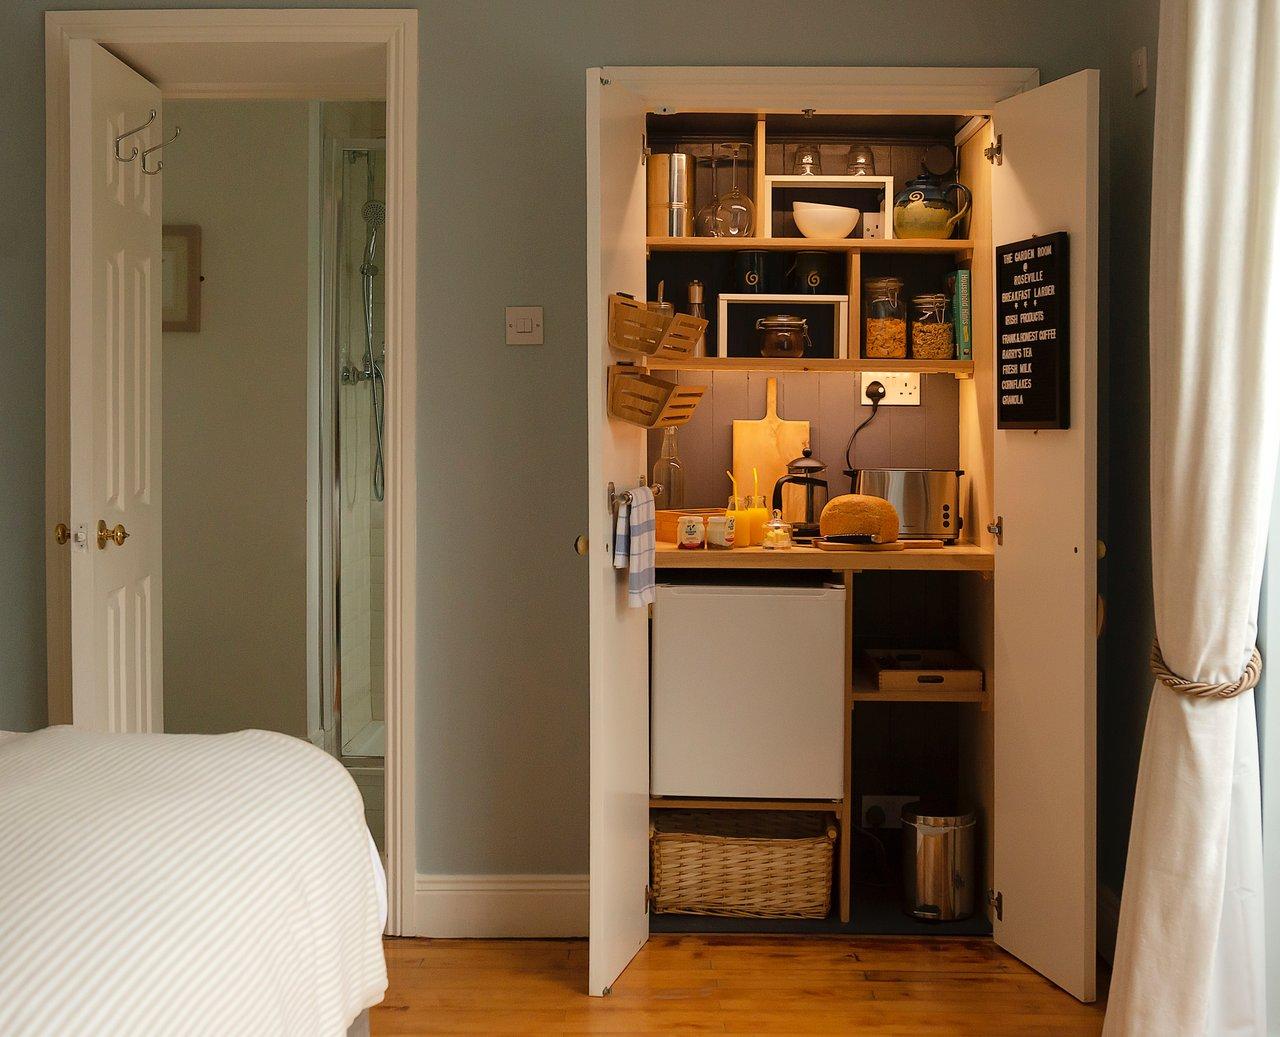 AVONMORE HOUSE - Prices & Guest house - TripAdvisor